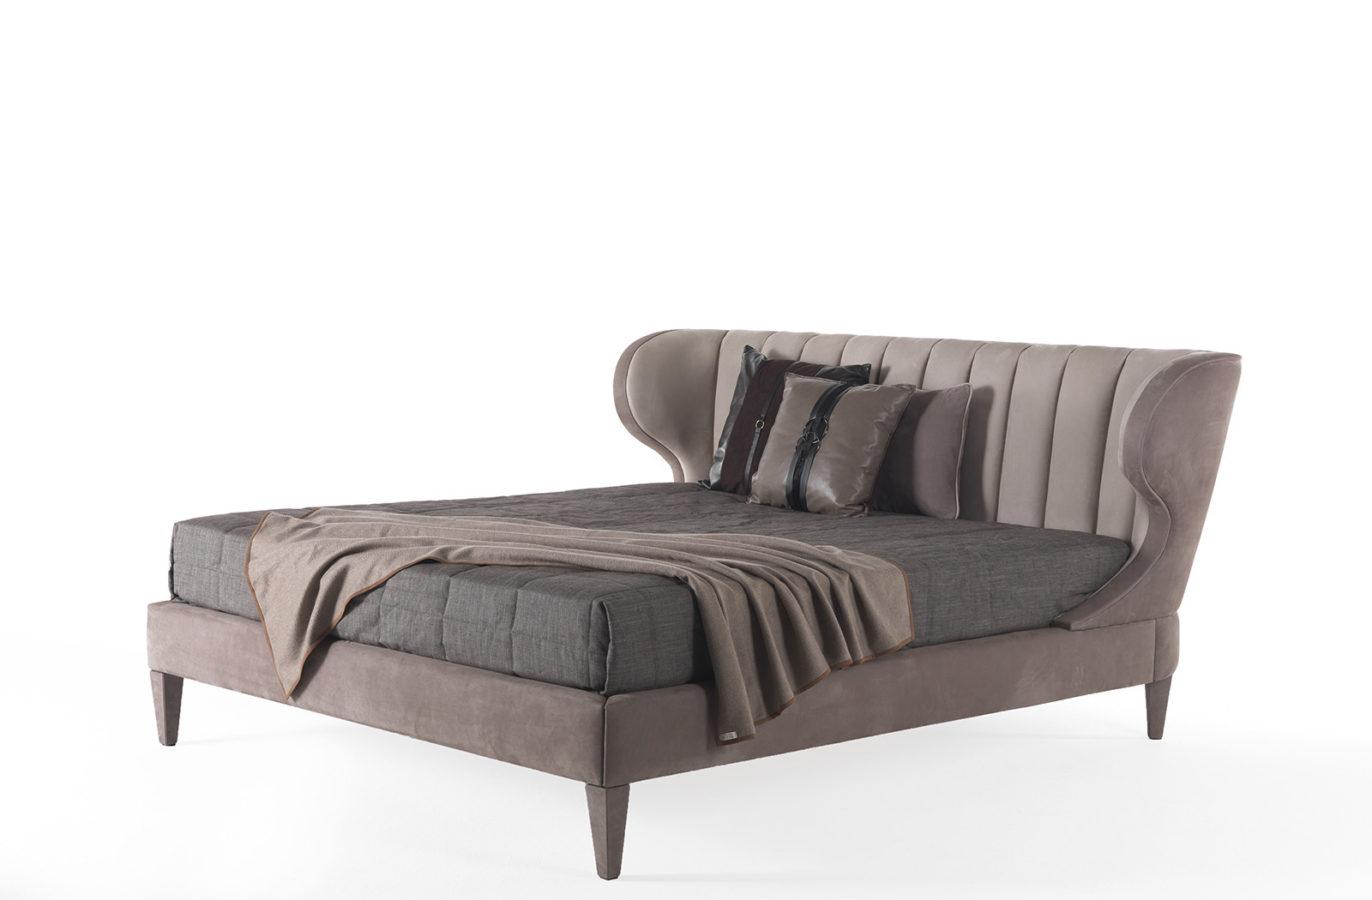 Dunlop Bed 1